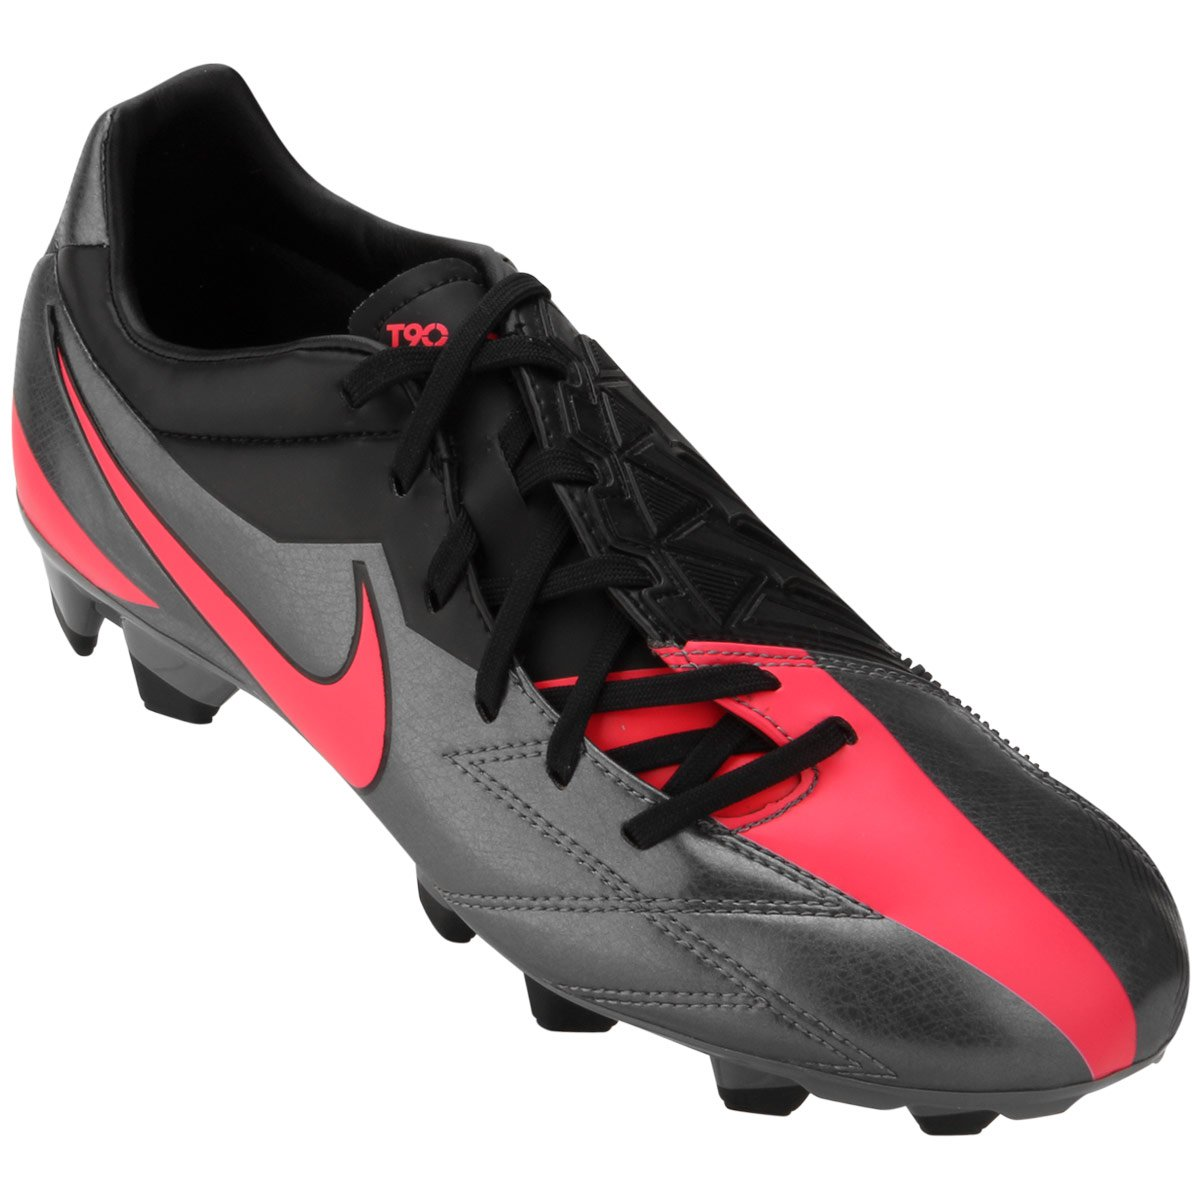 bf89bc7783 Chuteira Nike Total 90 Strike 4 FG - Compre Agora